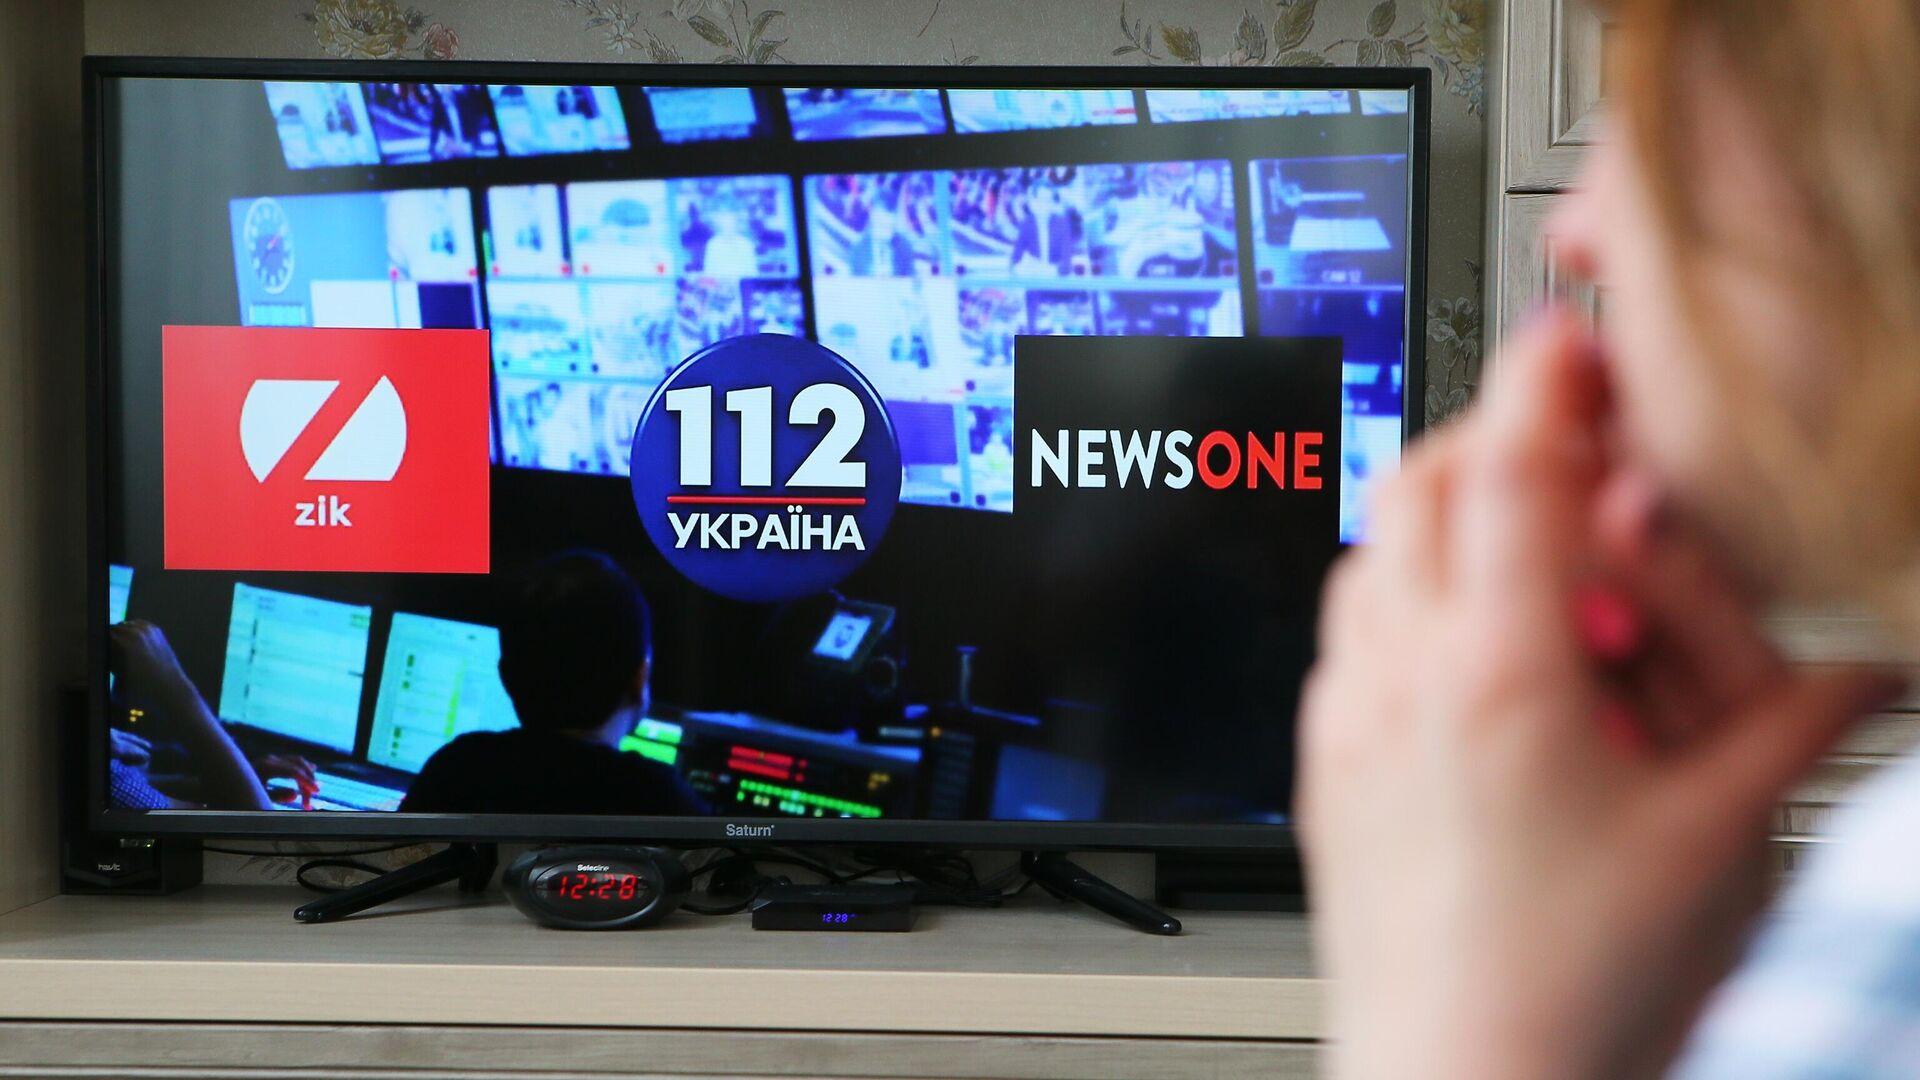 Экран телевизора с логотипами телеканалов ZIK, 112.Украина и NewsOne - РИА Новости, 1920, 04.02.2021